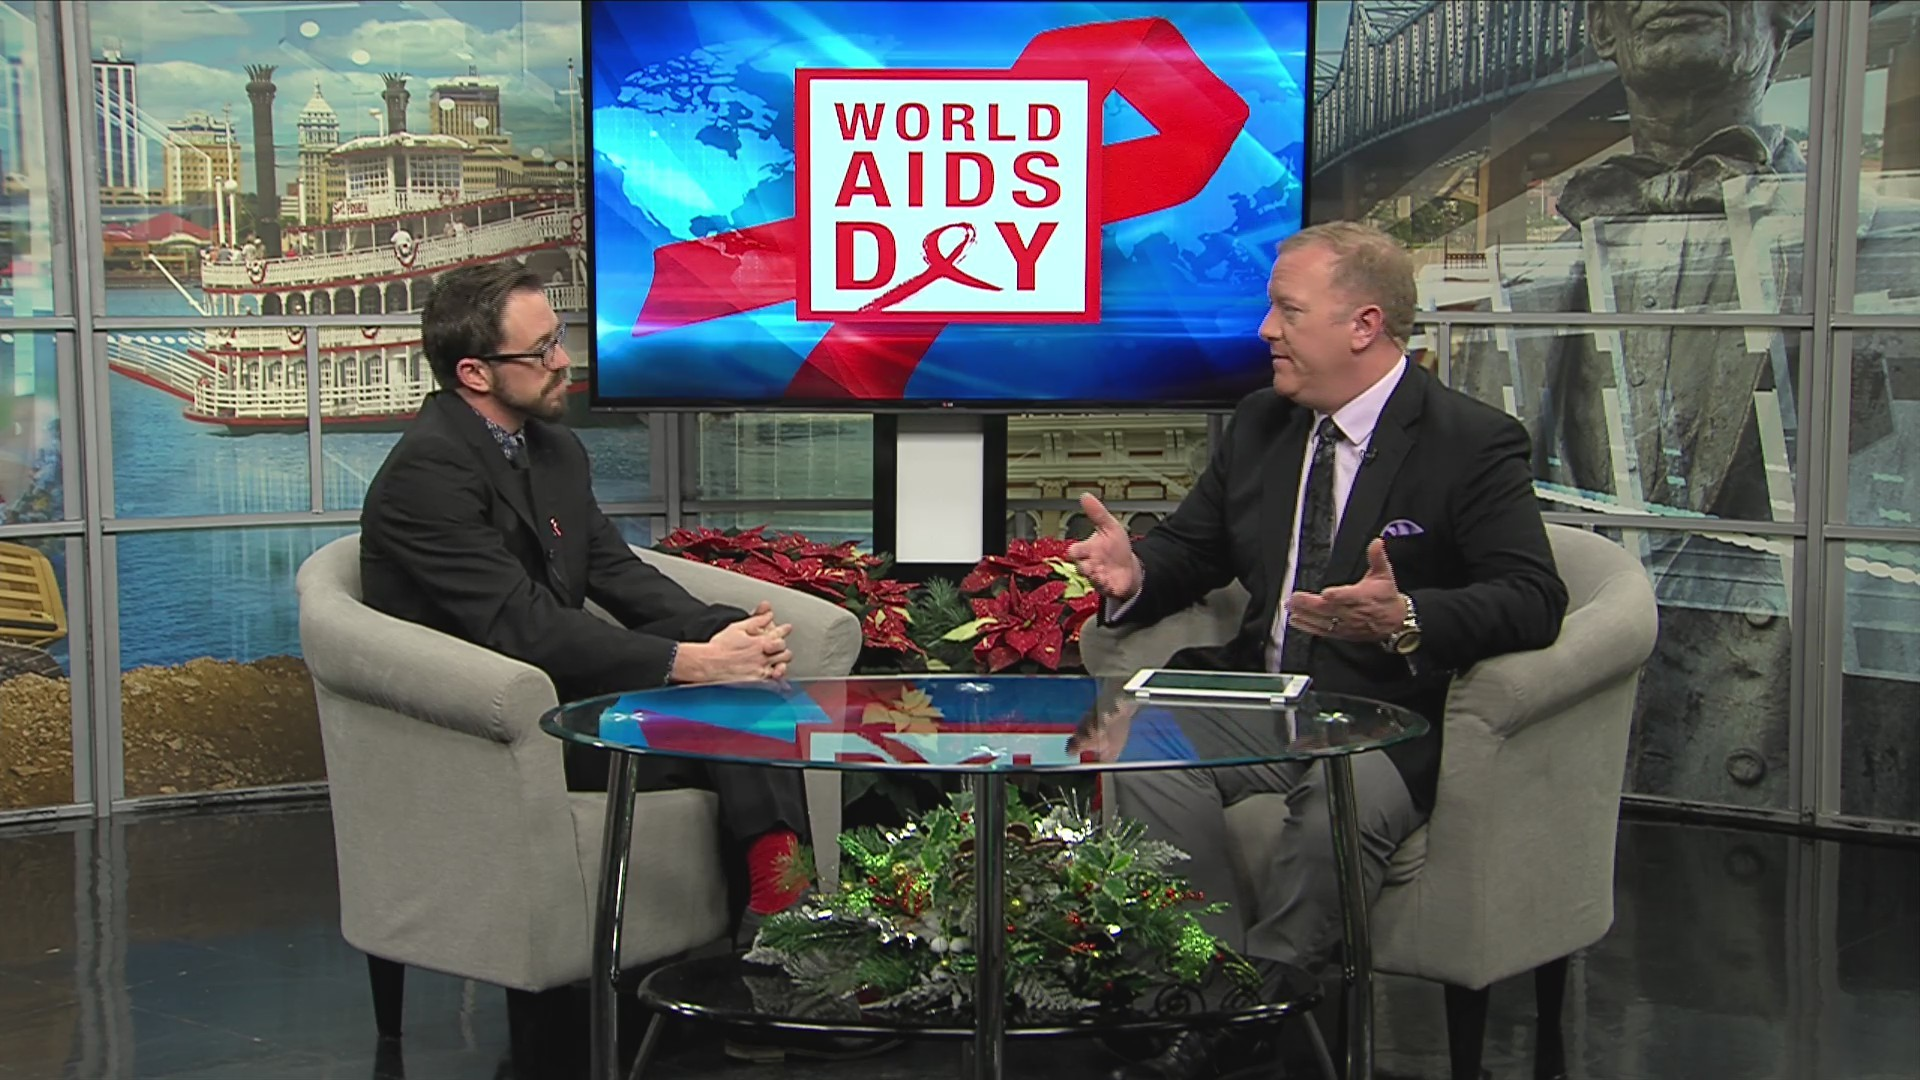 WORLD AIDS DAY WMBD